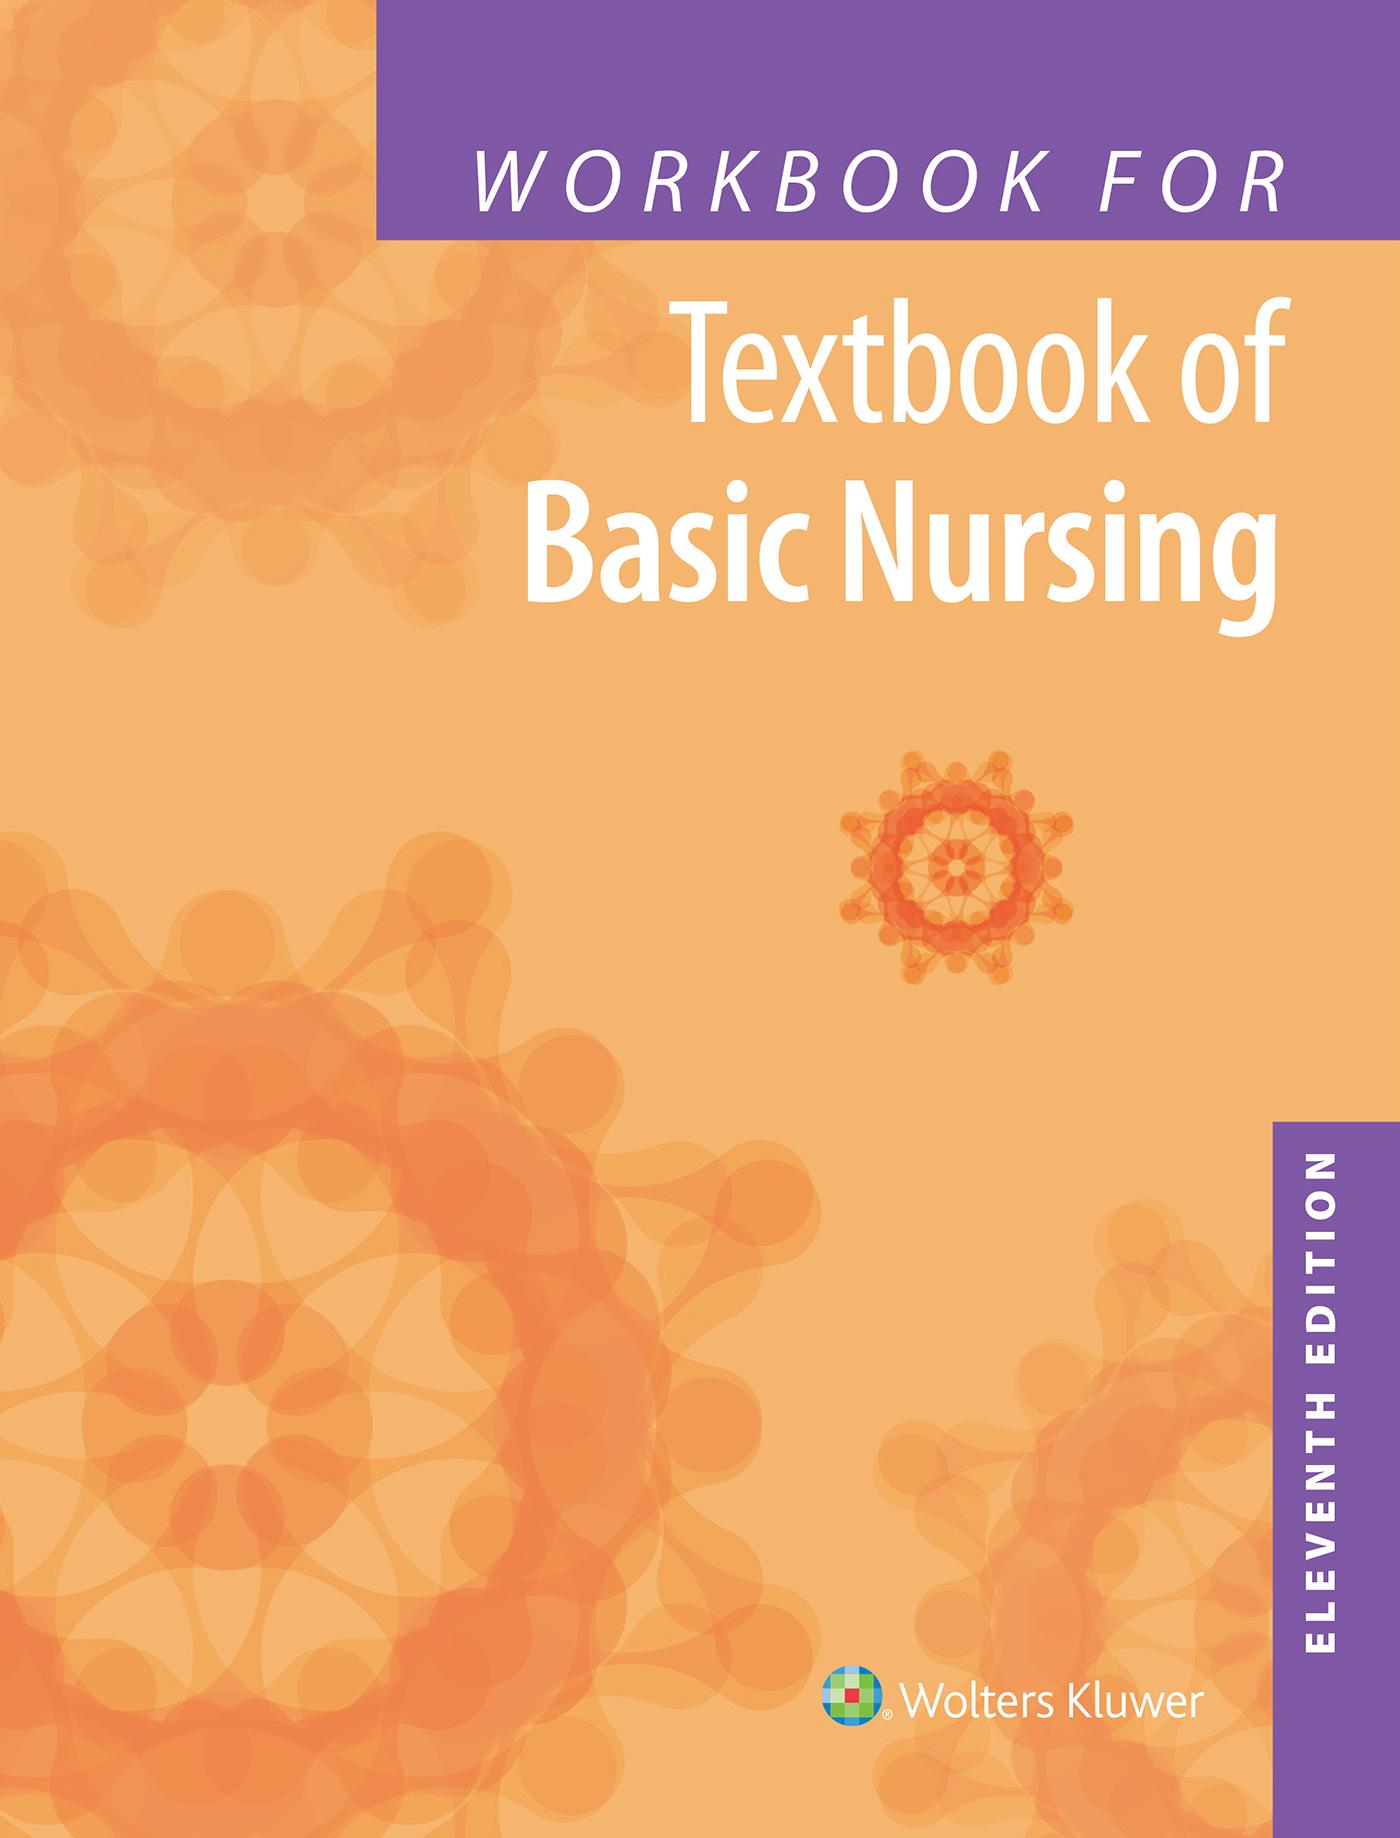 Workbook for textbook of basic nursing fandeluxe Choice Image